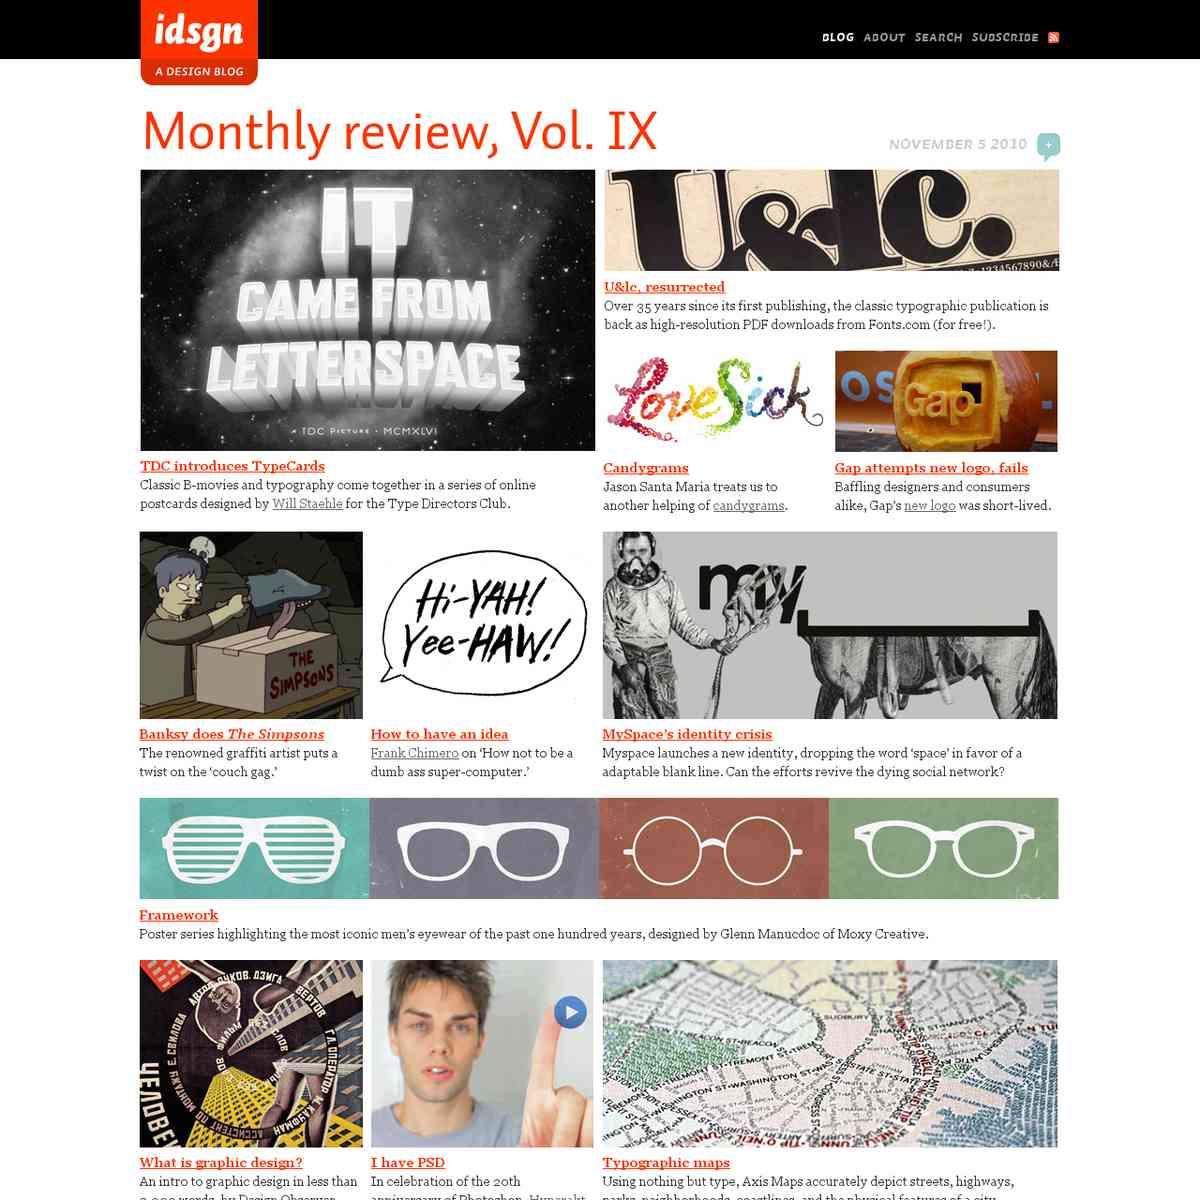 Monthly review, Vol. IX: idsgn (a design blog)